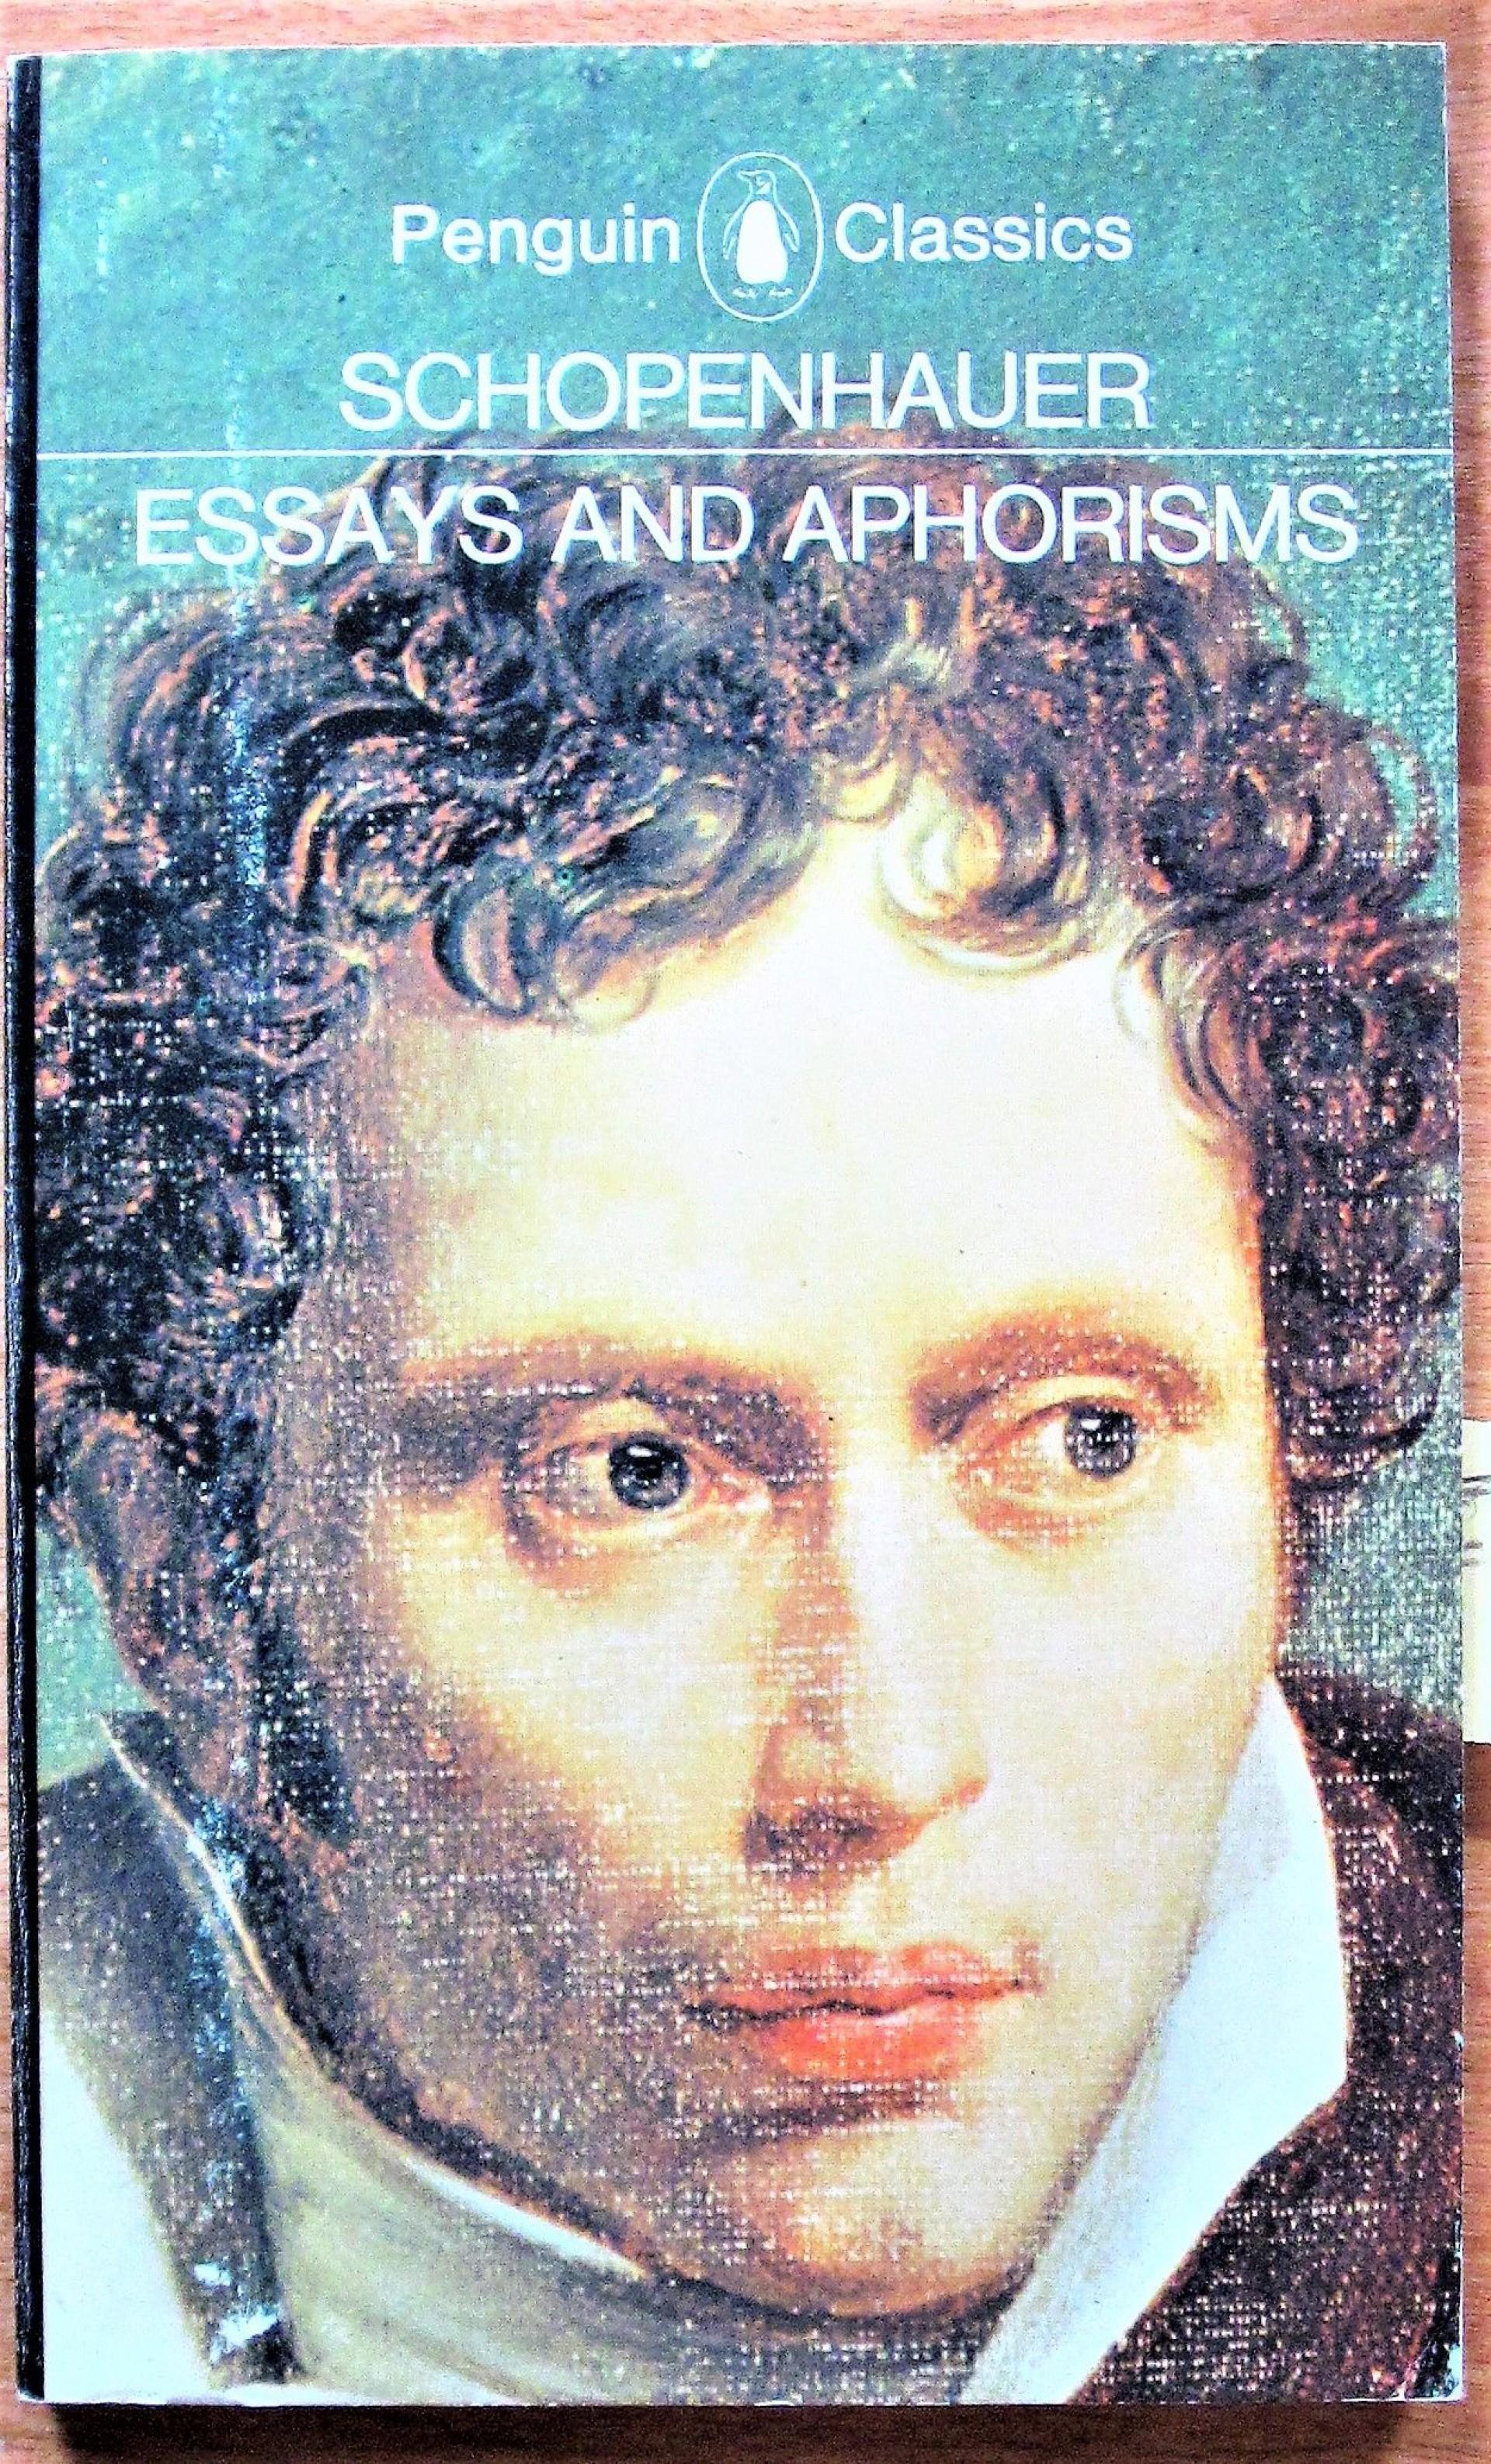 003 Essays And Aphorisms X Essay Frightening By Arthur Schopenhauer Pdf 1920